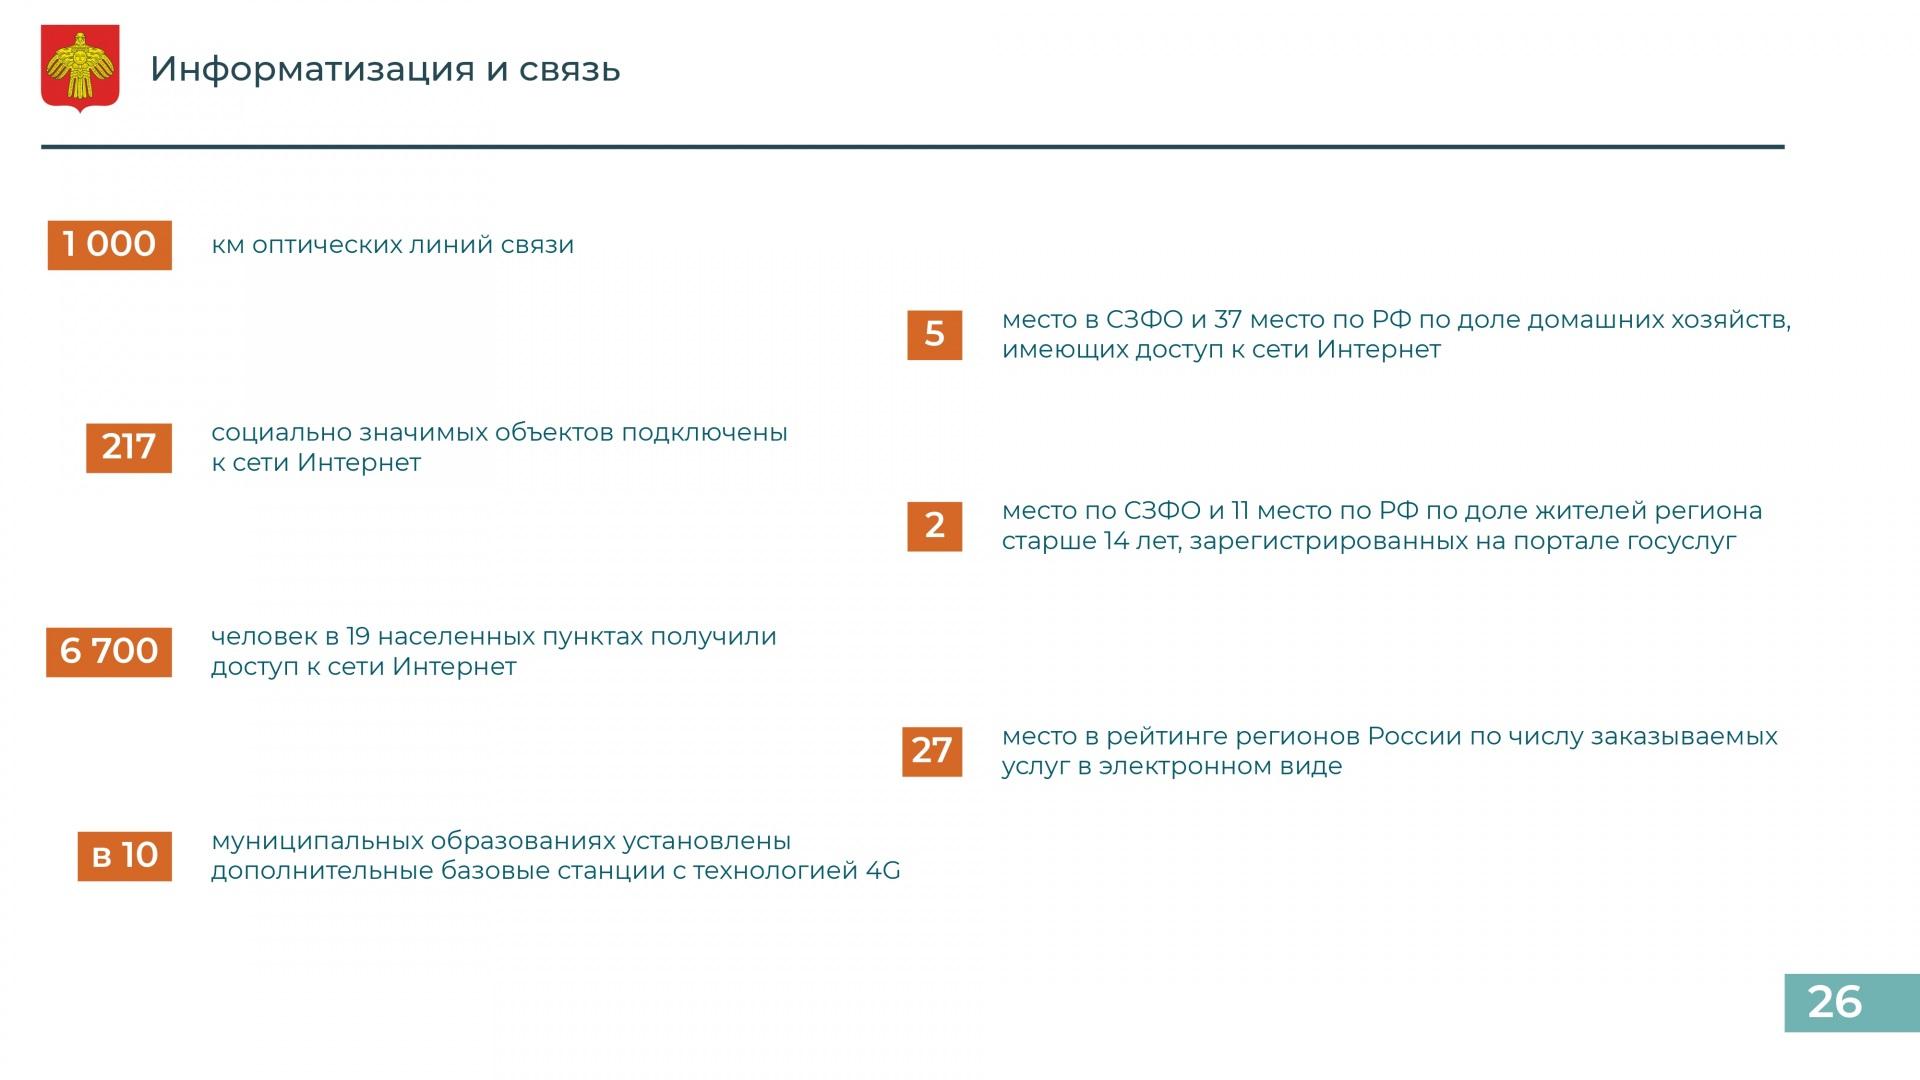 Doklad_Glavy_2021_page-0026.jpg